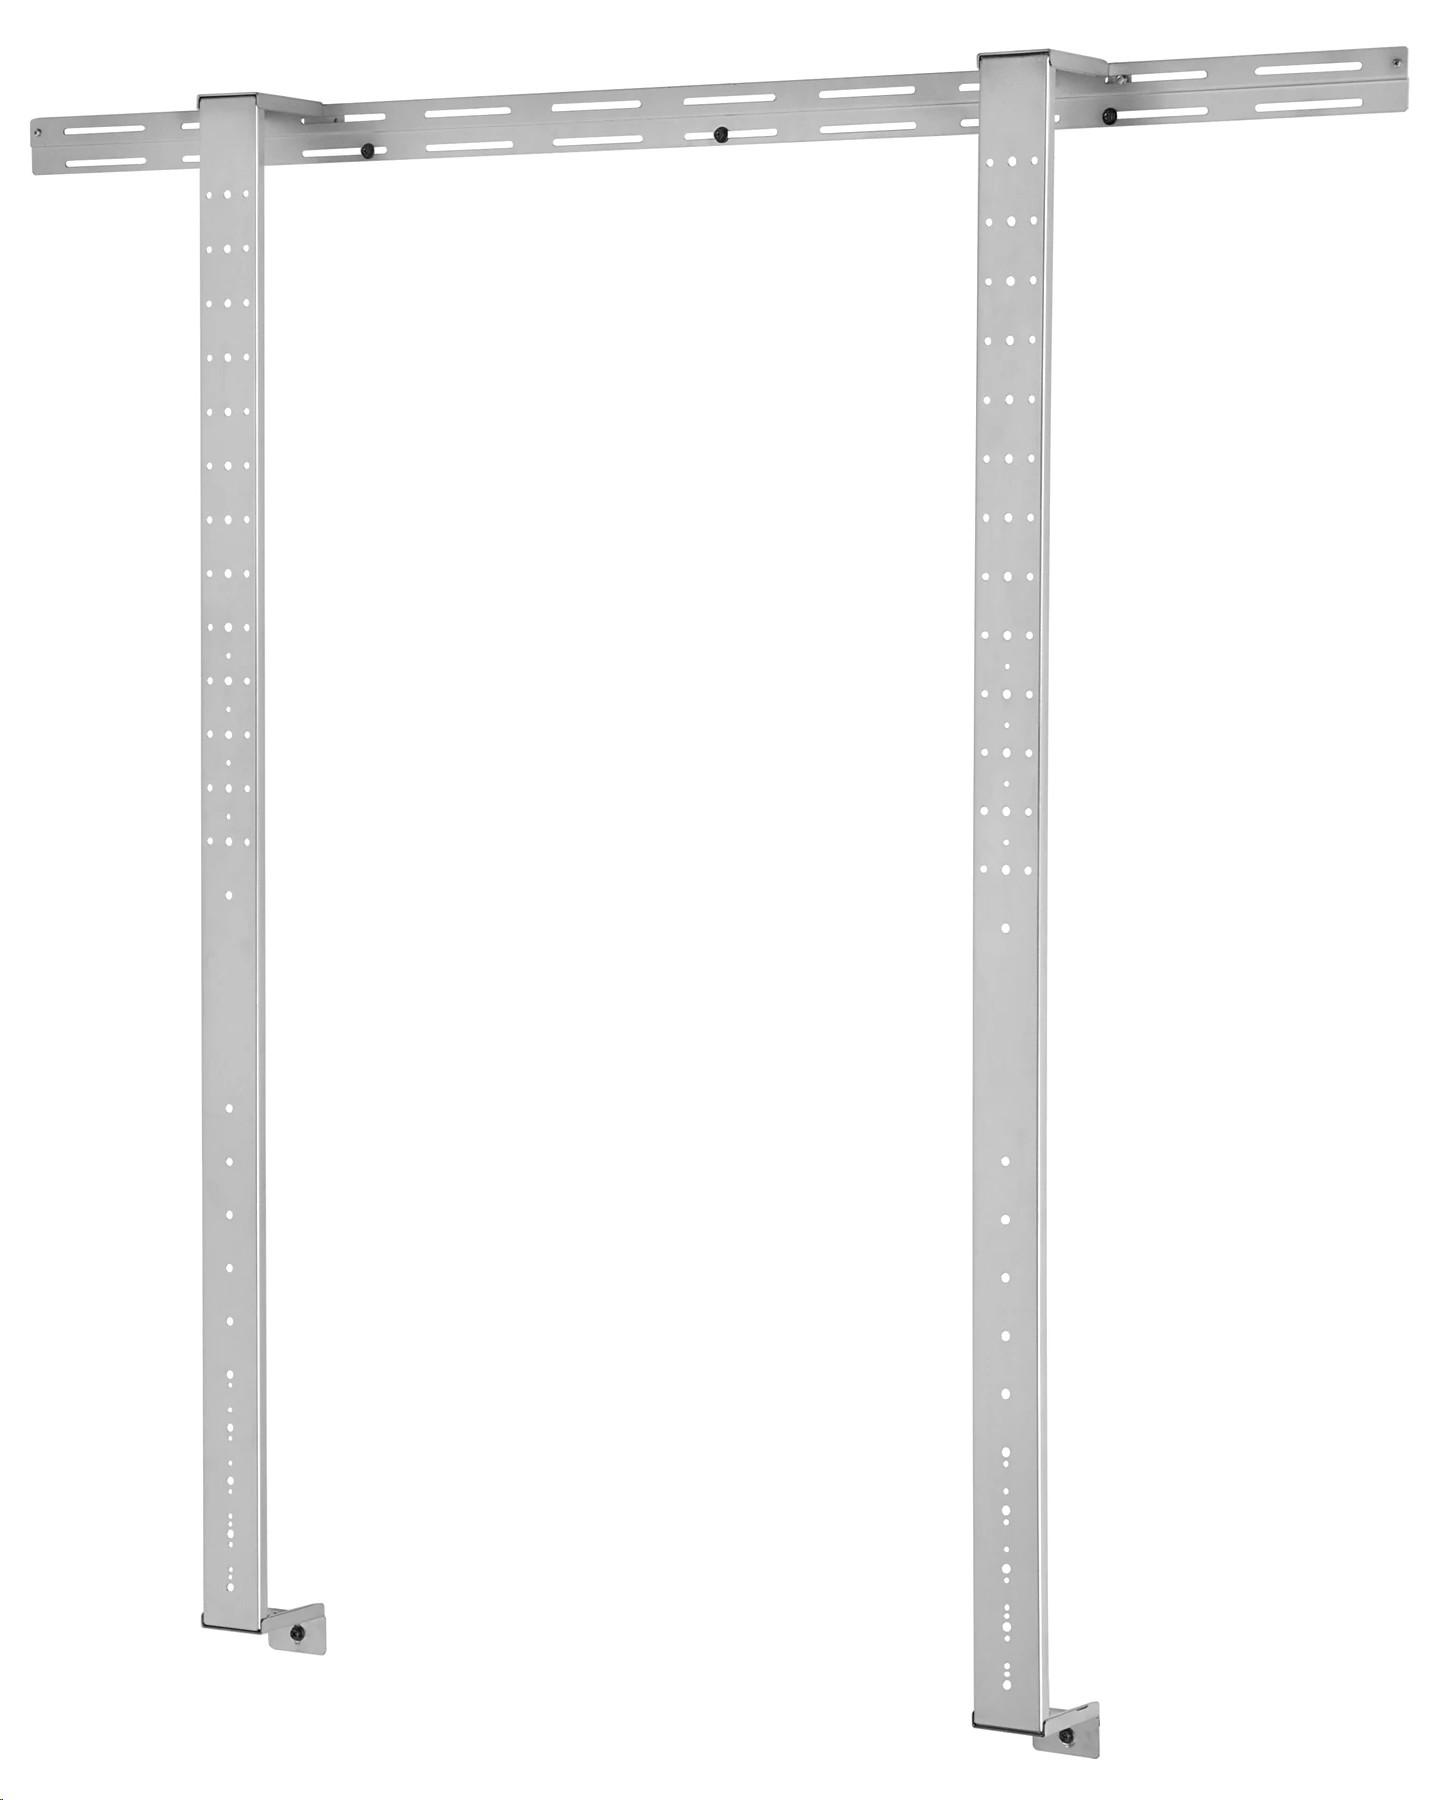 Peerless Peerless-AV Whiteboard Mount IWB600-2SB